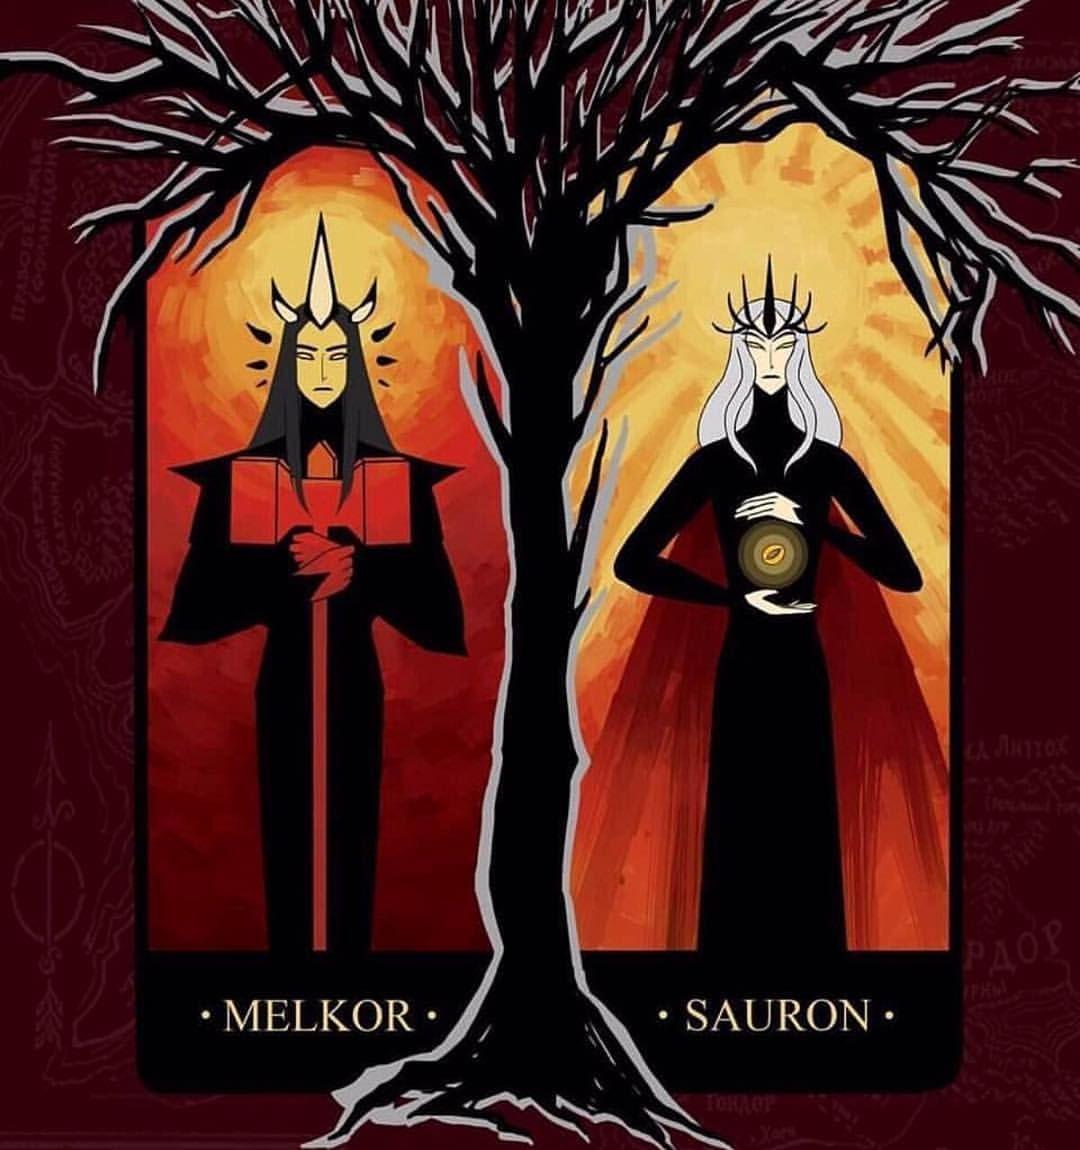 The Dark Lords Melkor Sauron Www Immortaltolkien Com Link In Bio Follow Immortal Tolkien Melkor The Hobbit Dark Lord